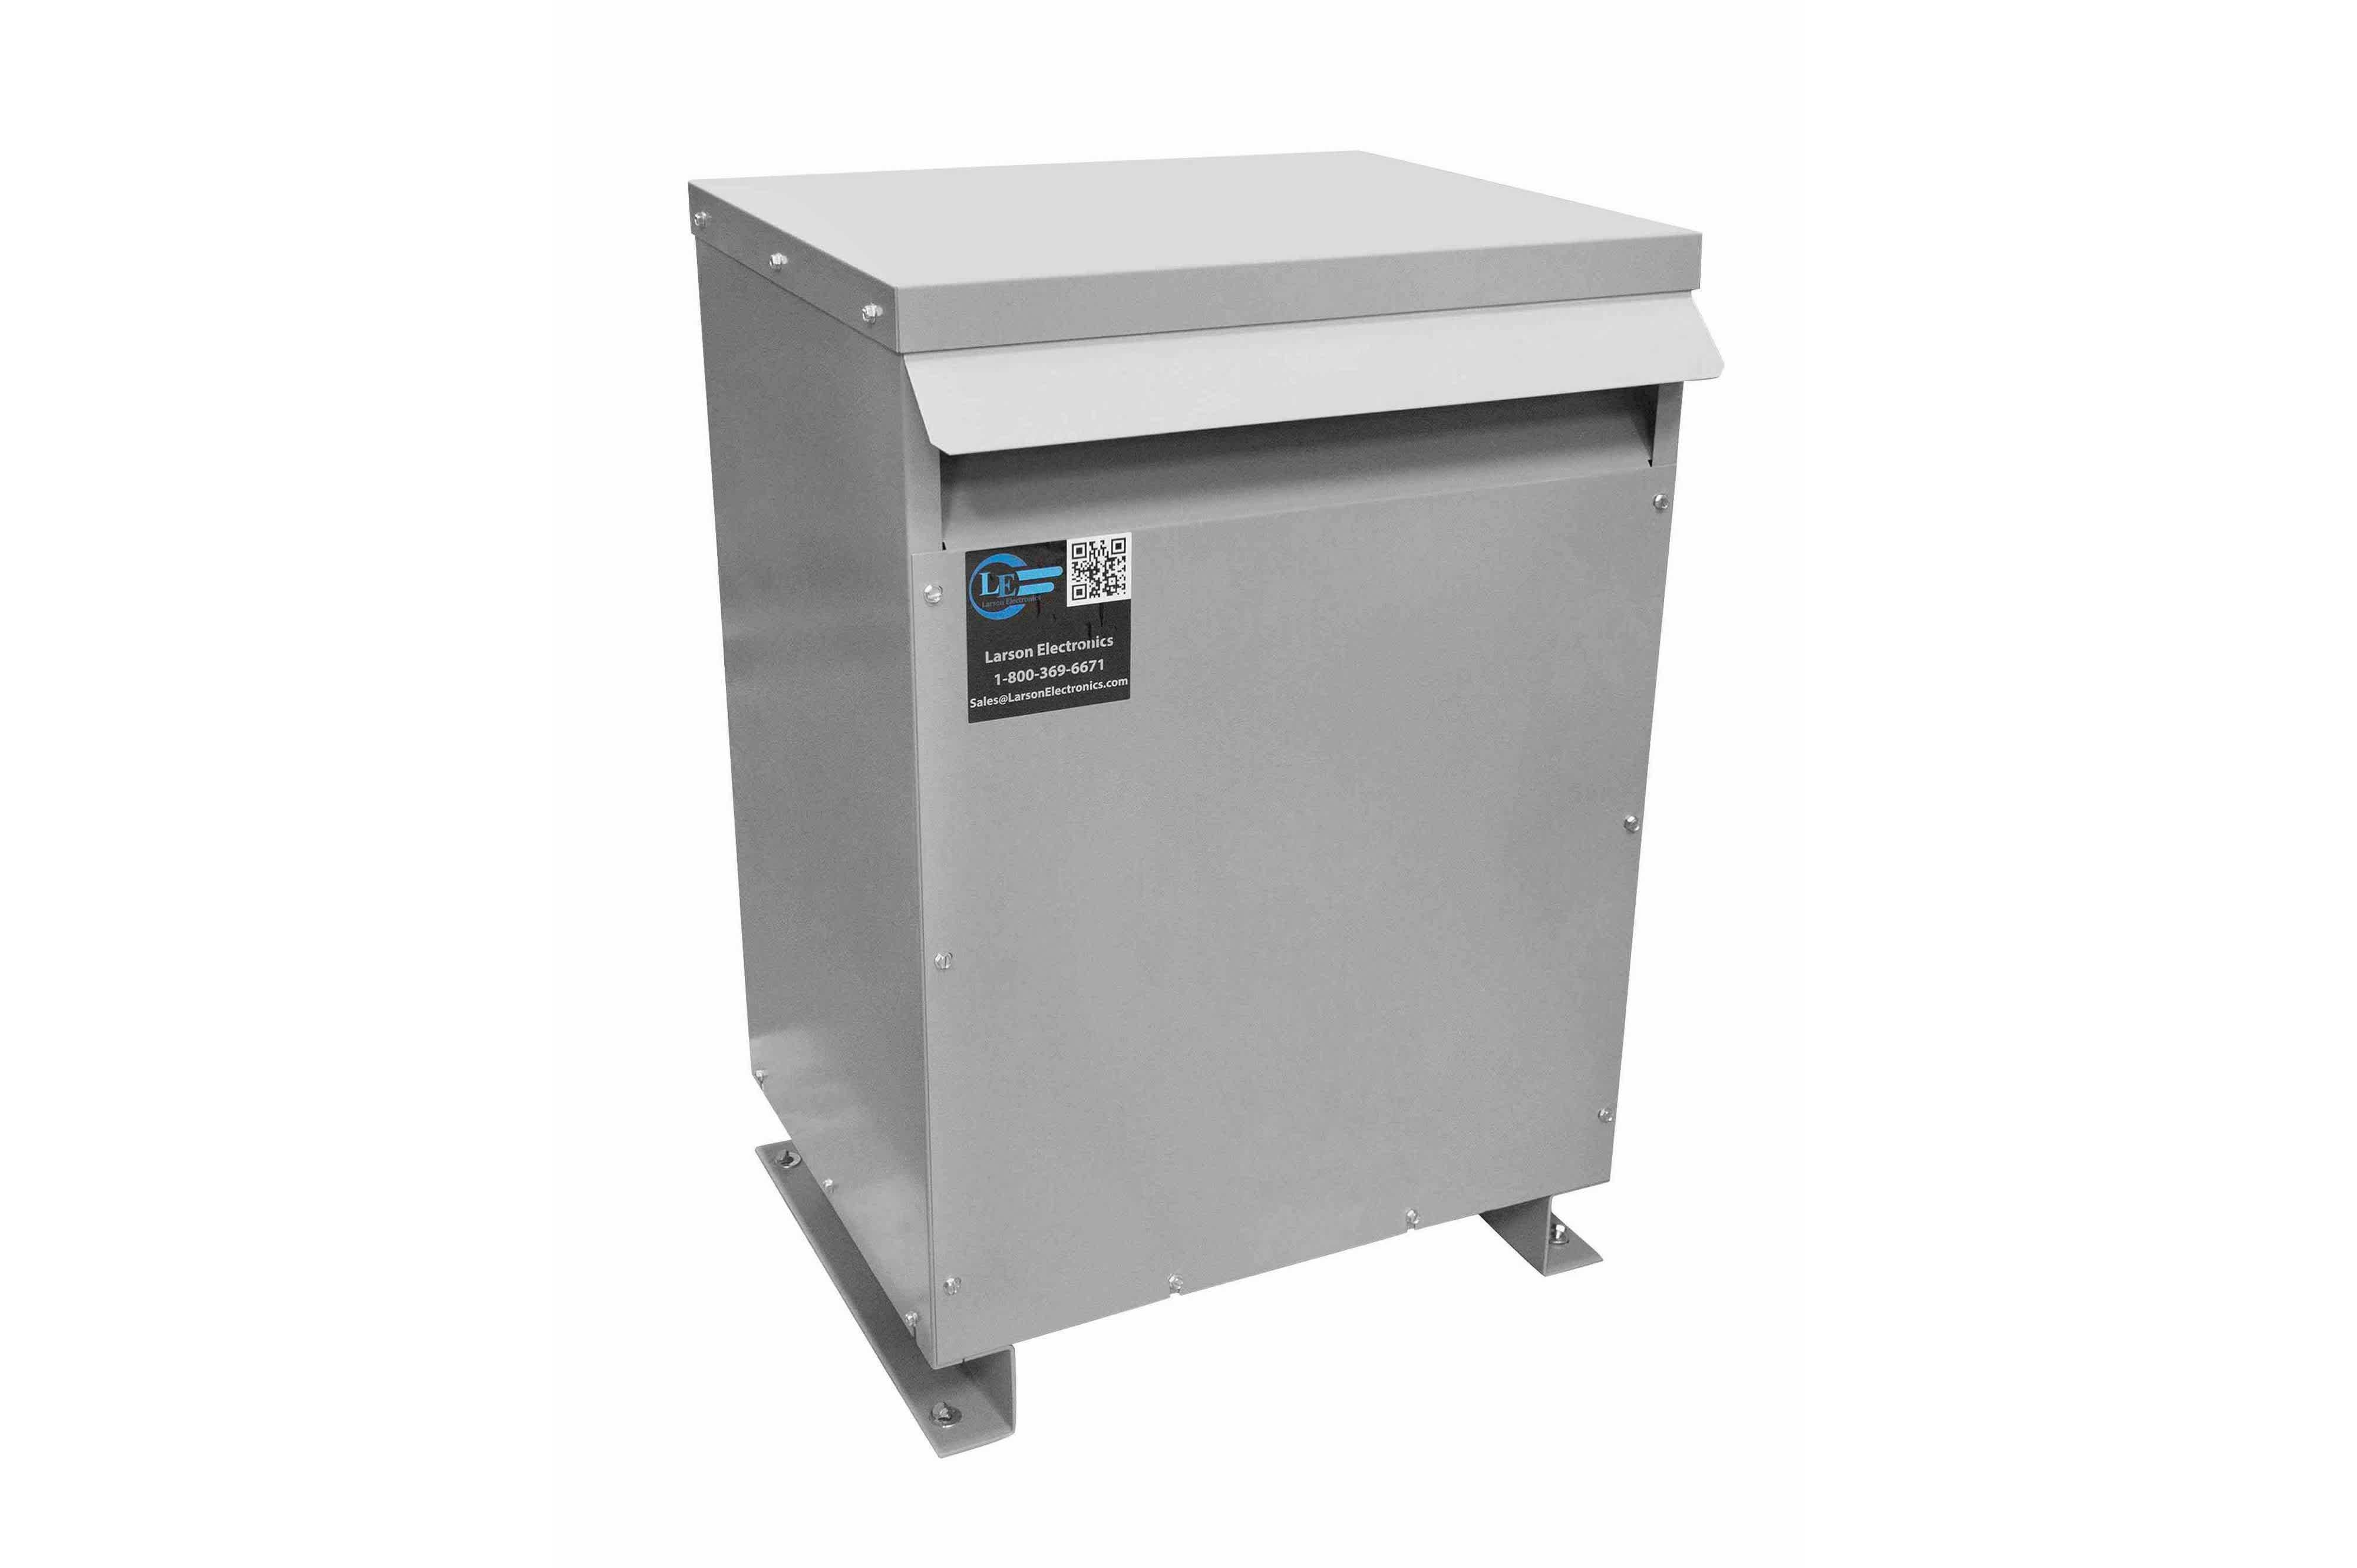 90 kVA 3PH Isolation Transformer, 380V Wye Primary, 240V/120 Delta Secondary, N3R, Ventilated, 60 Hz